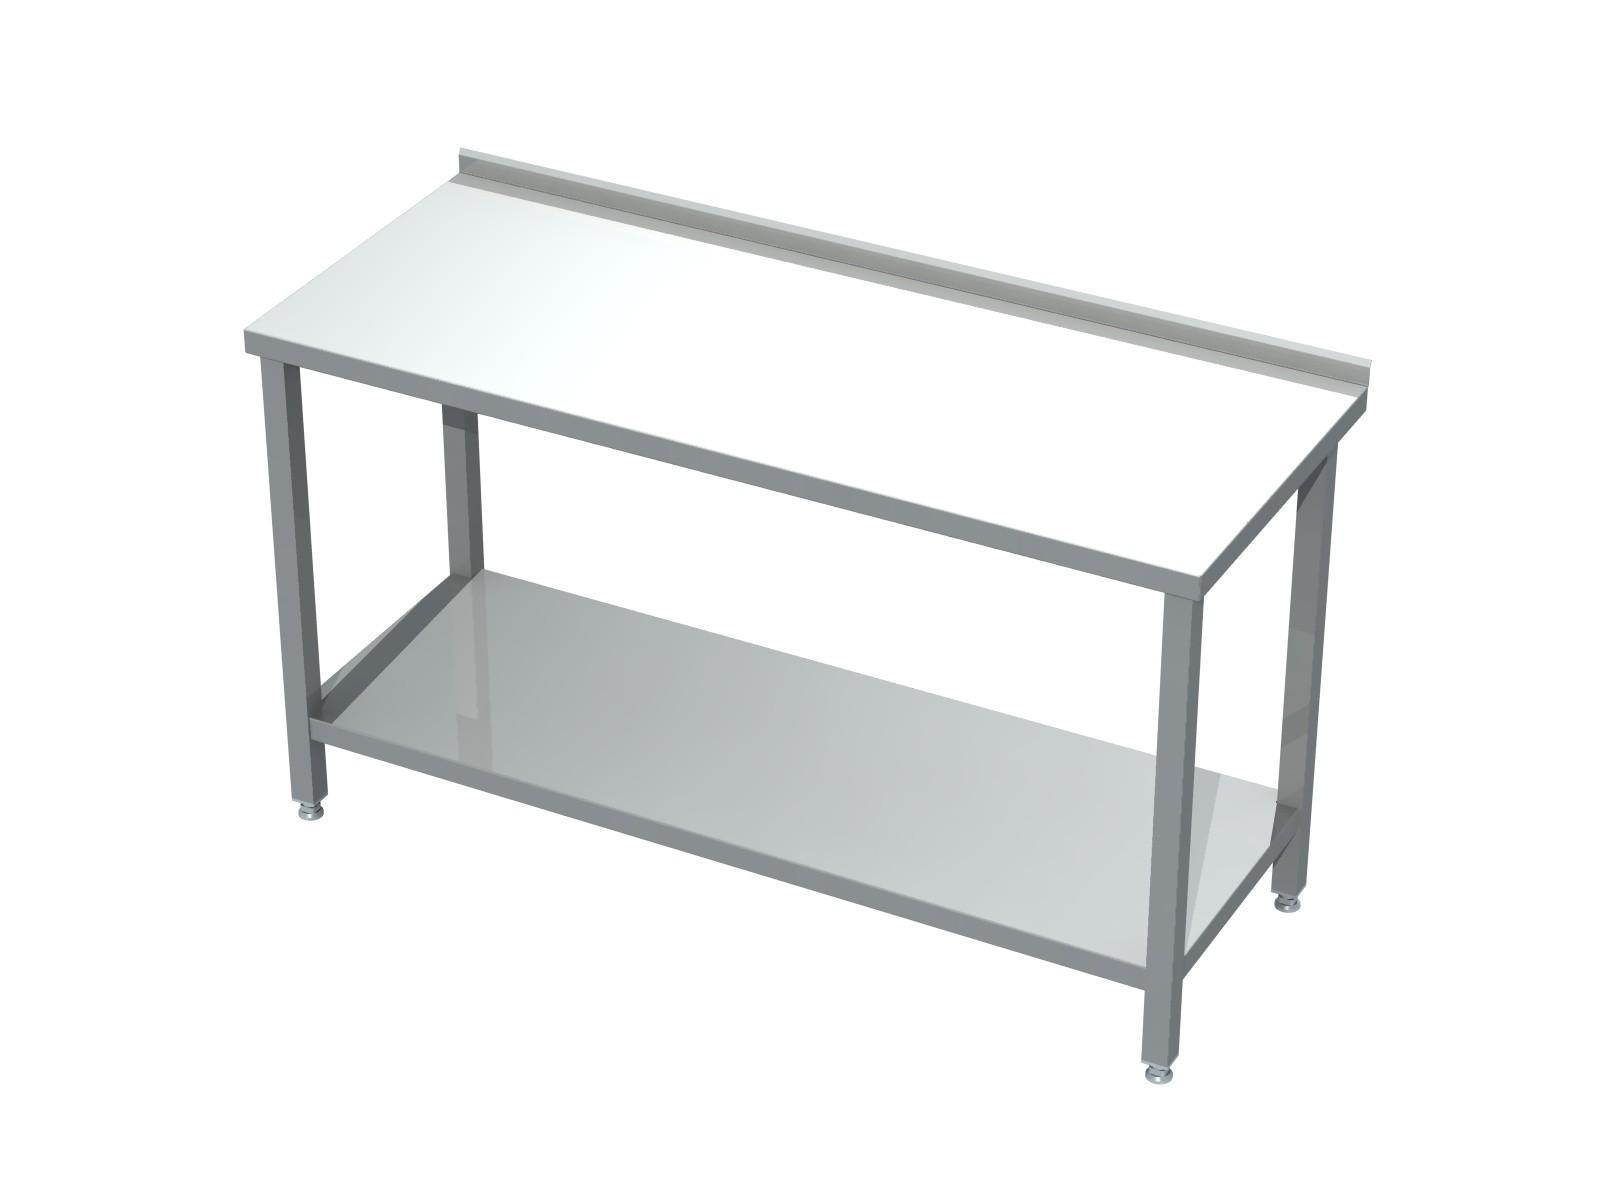 rustfri bord Rustfri stålbord i mange varianter og top kvalitet rustfri bord